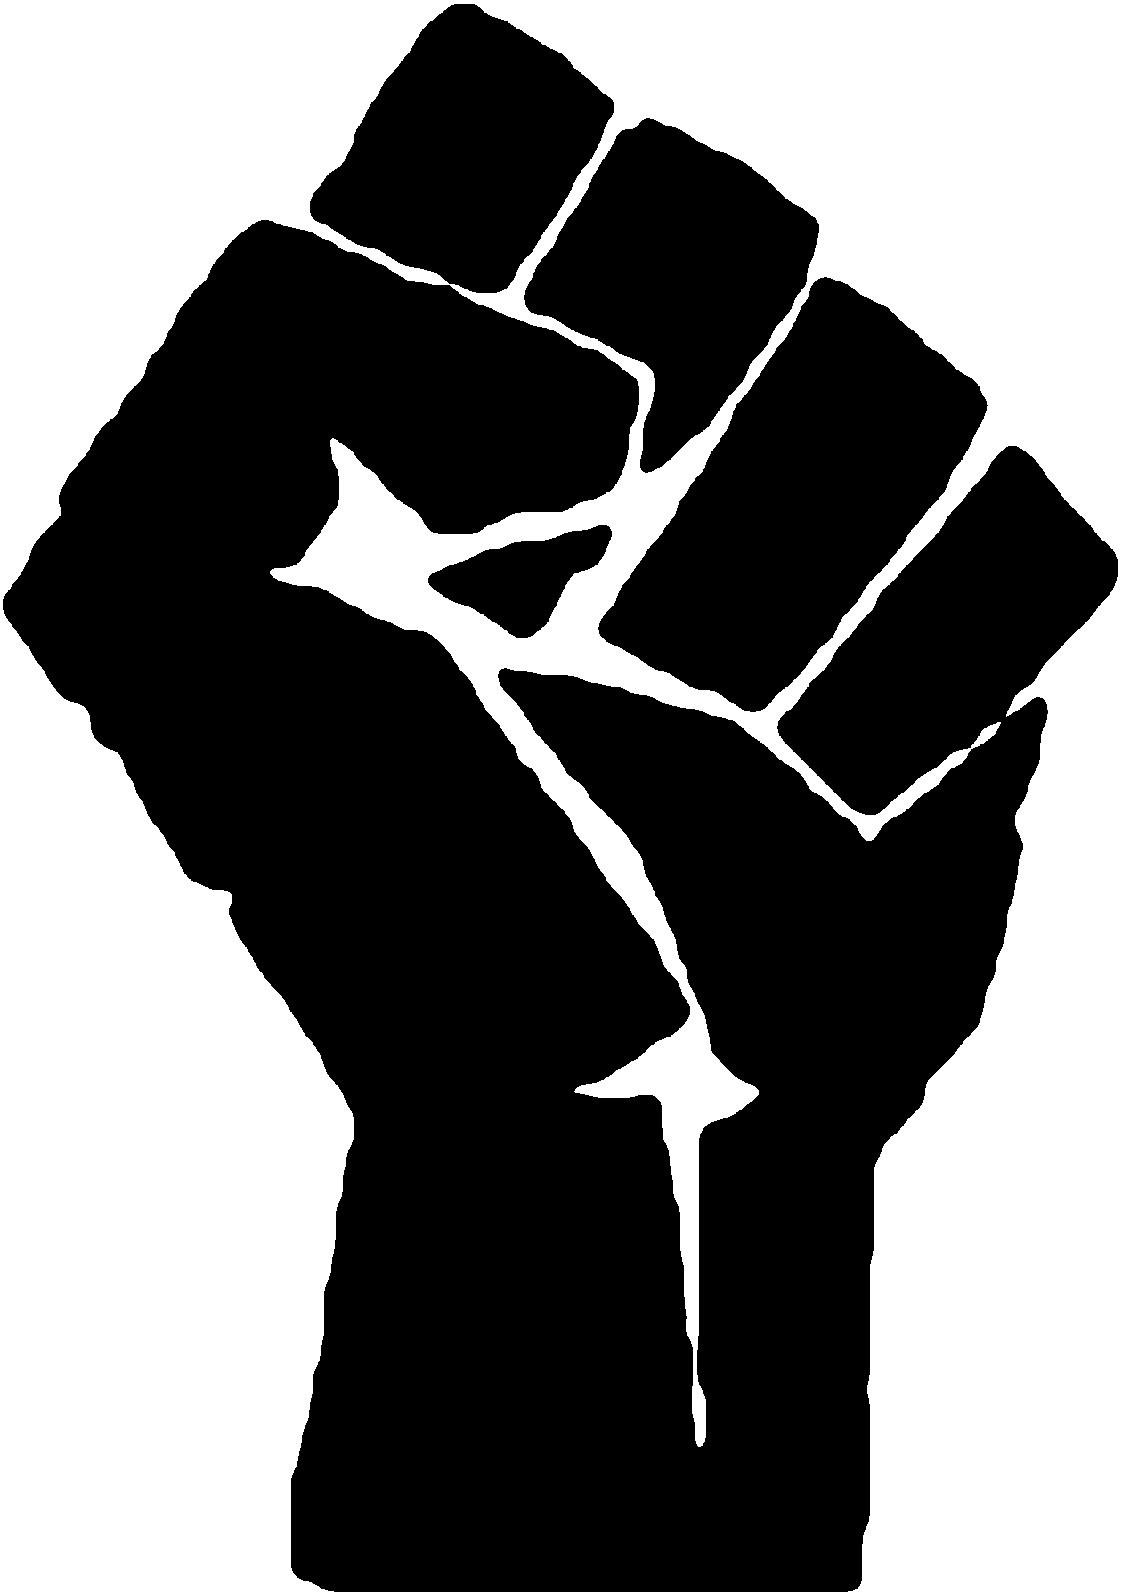 Black power the politics of liberation